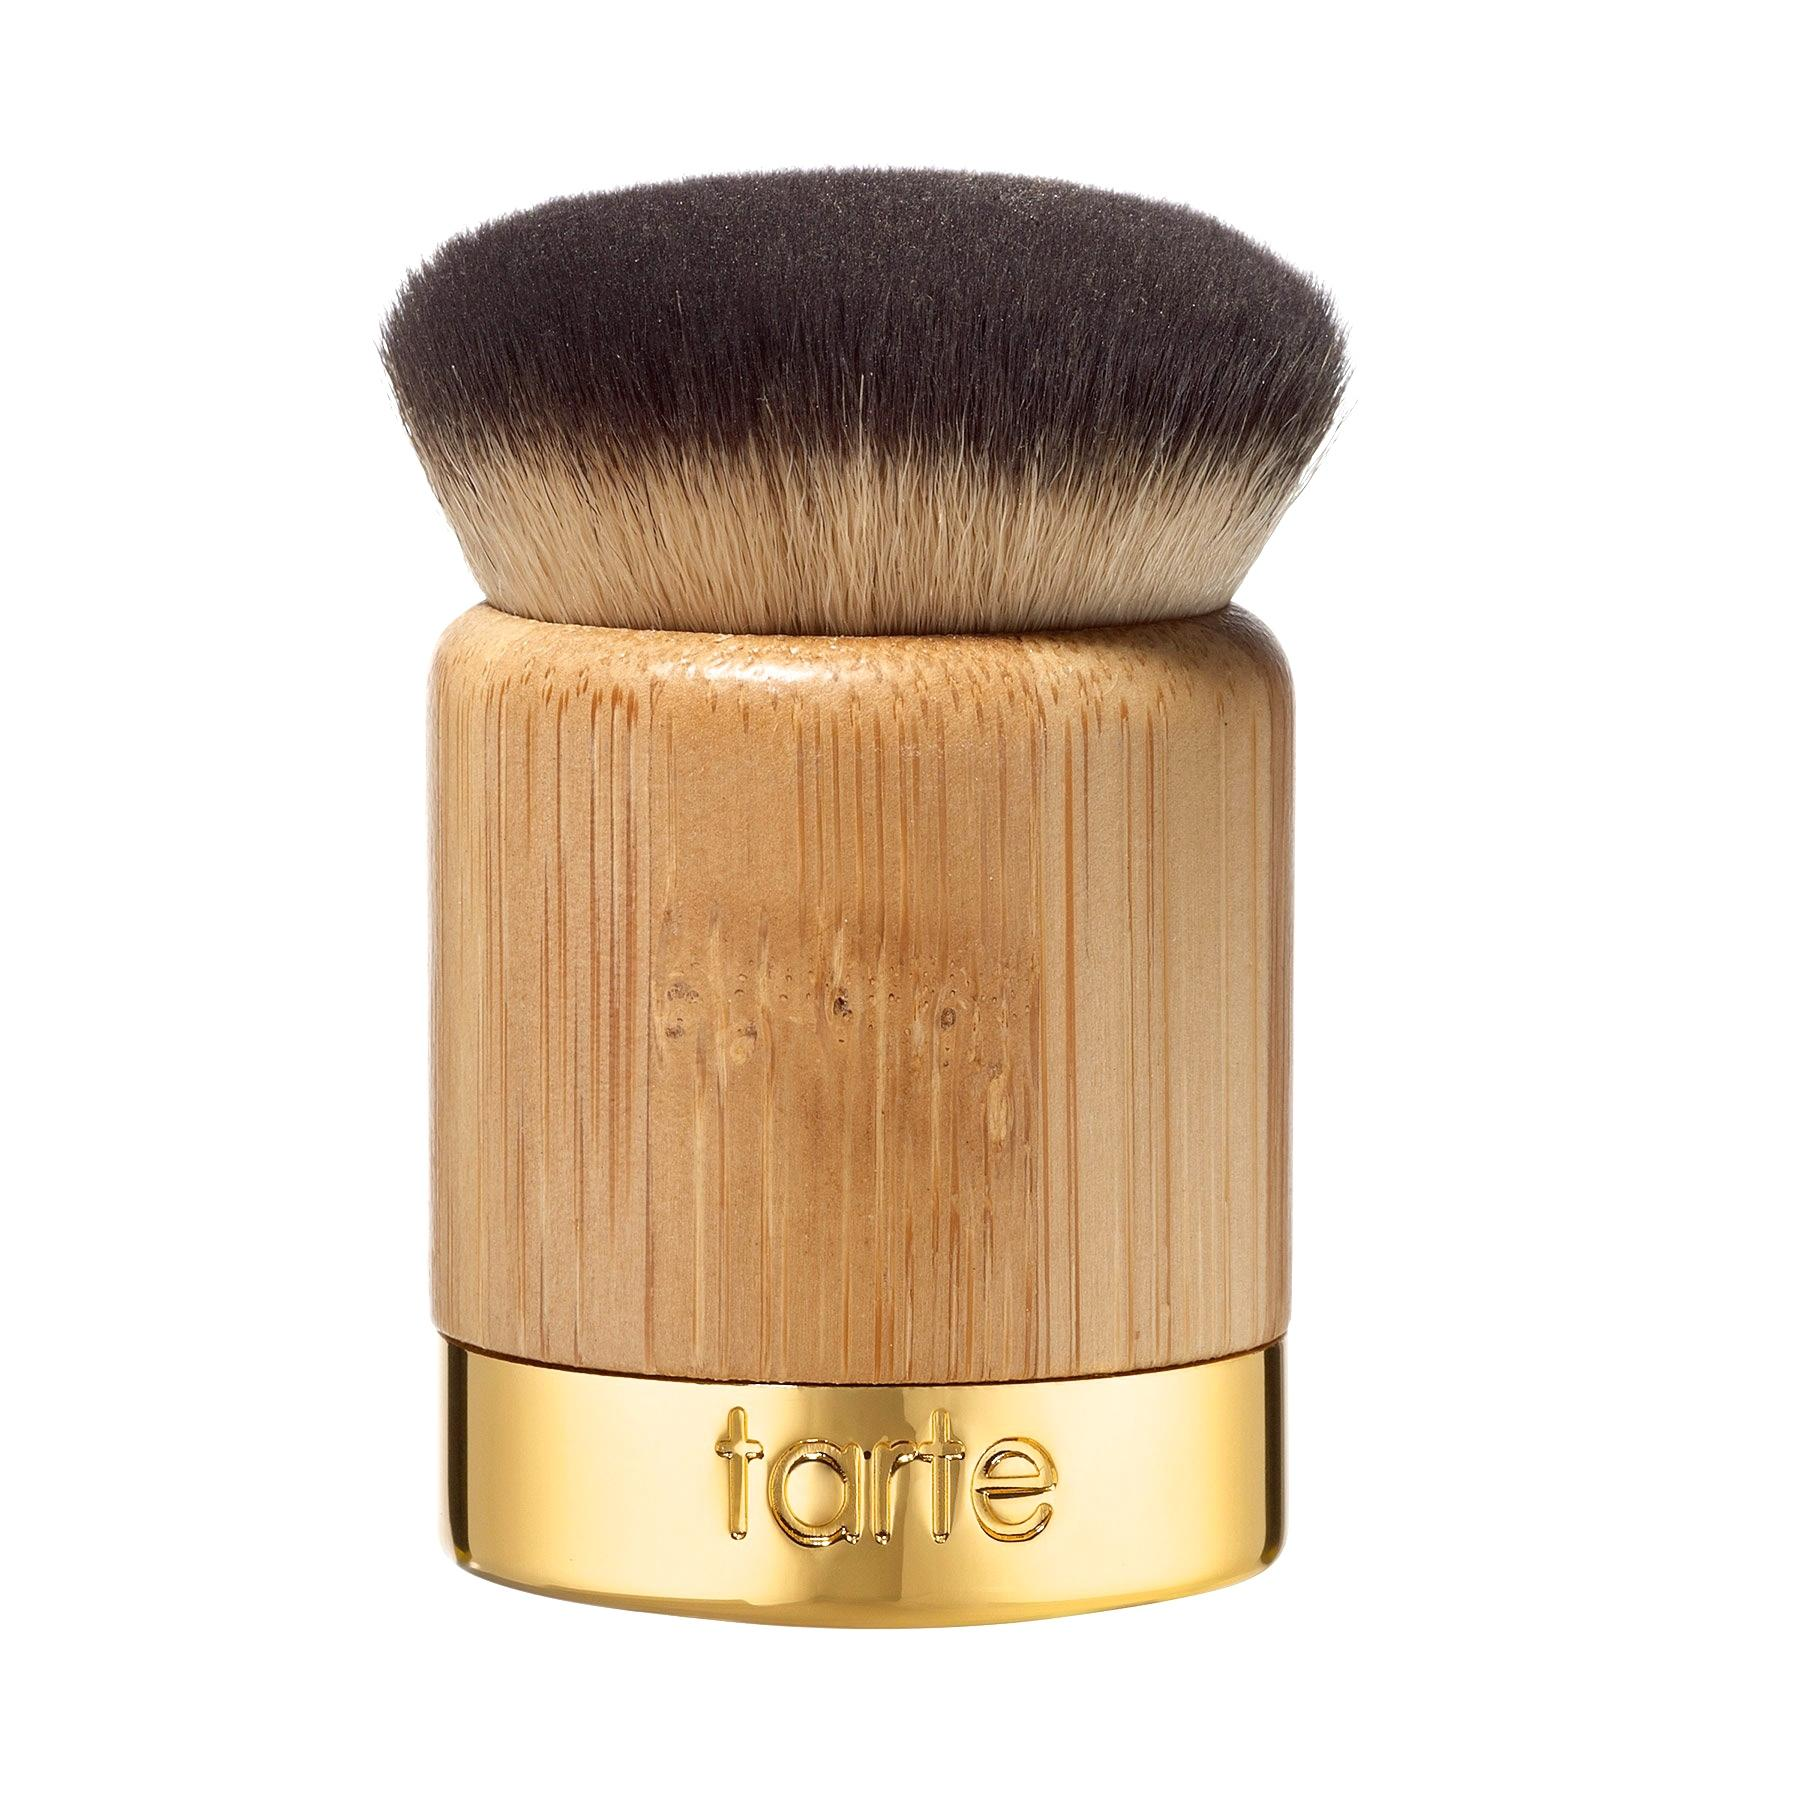 Tarte Airbuki Bamboo Powder Foundation Face Brush